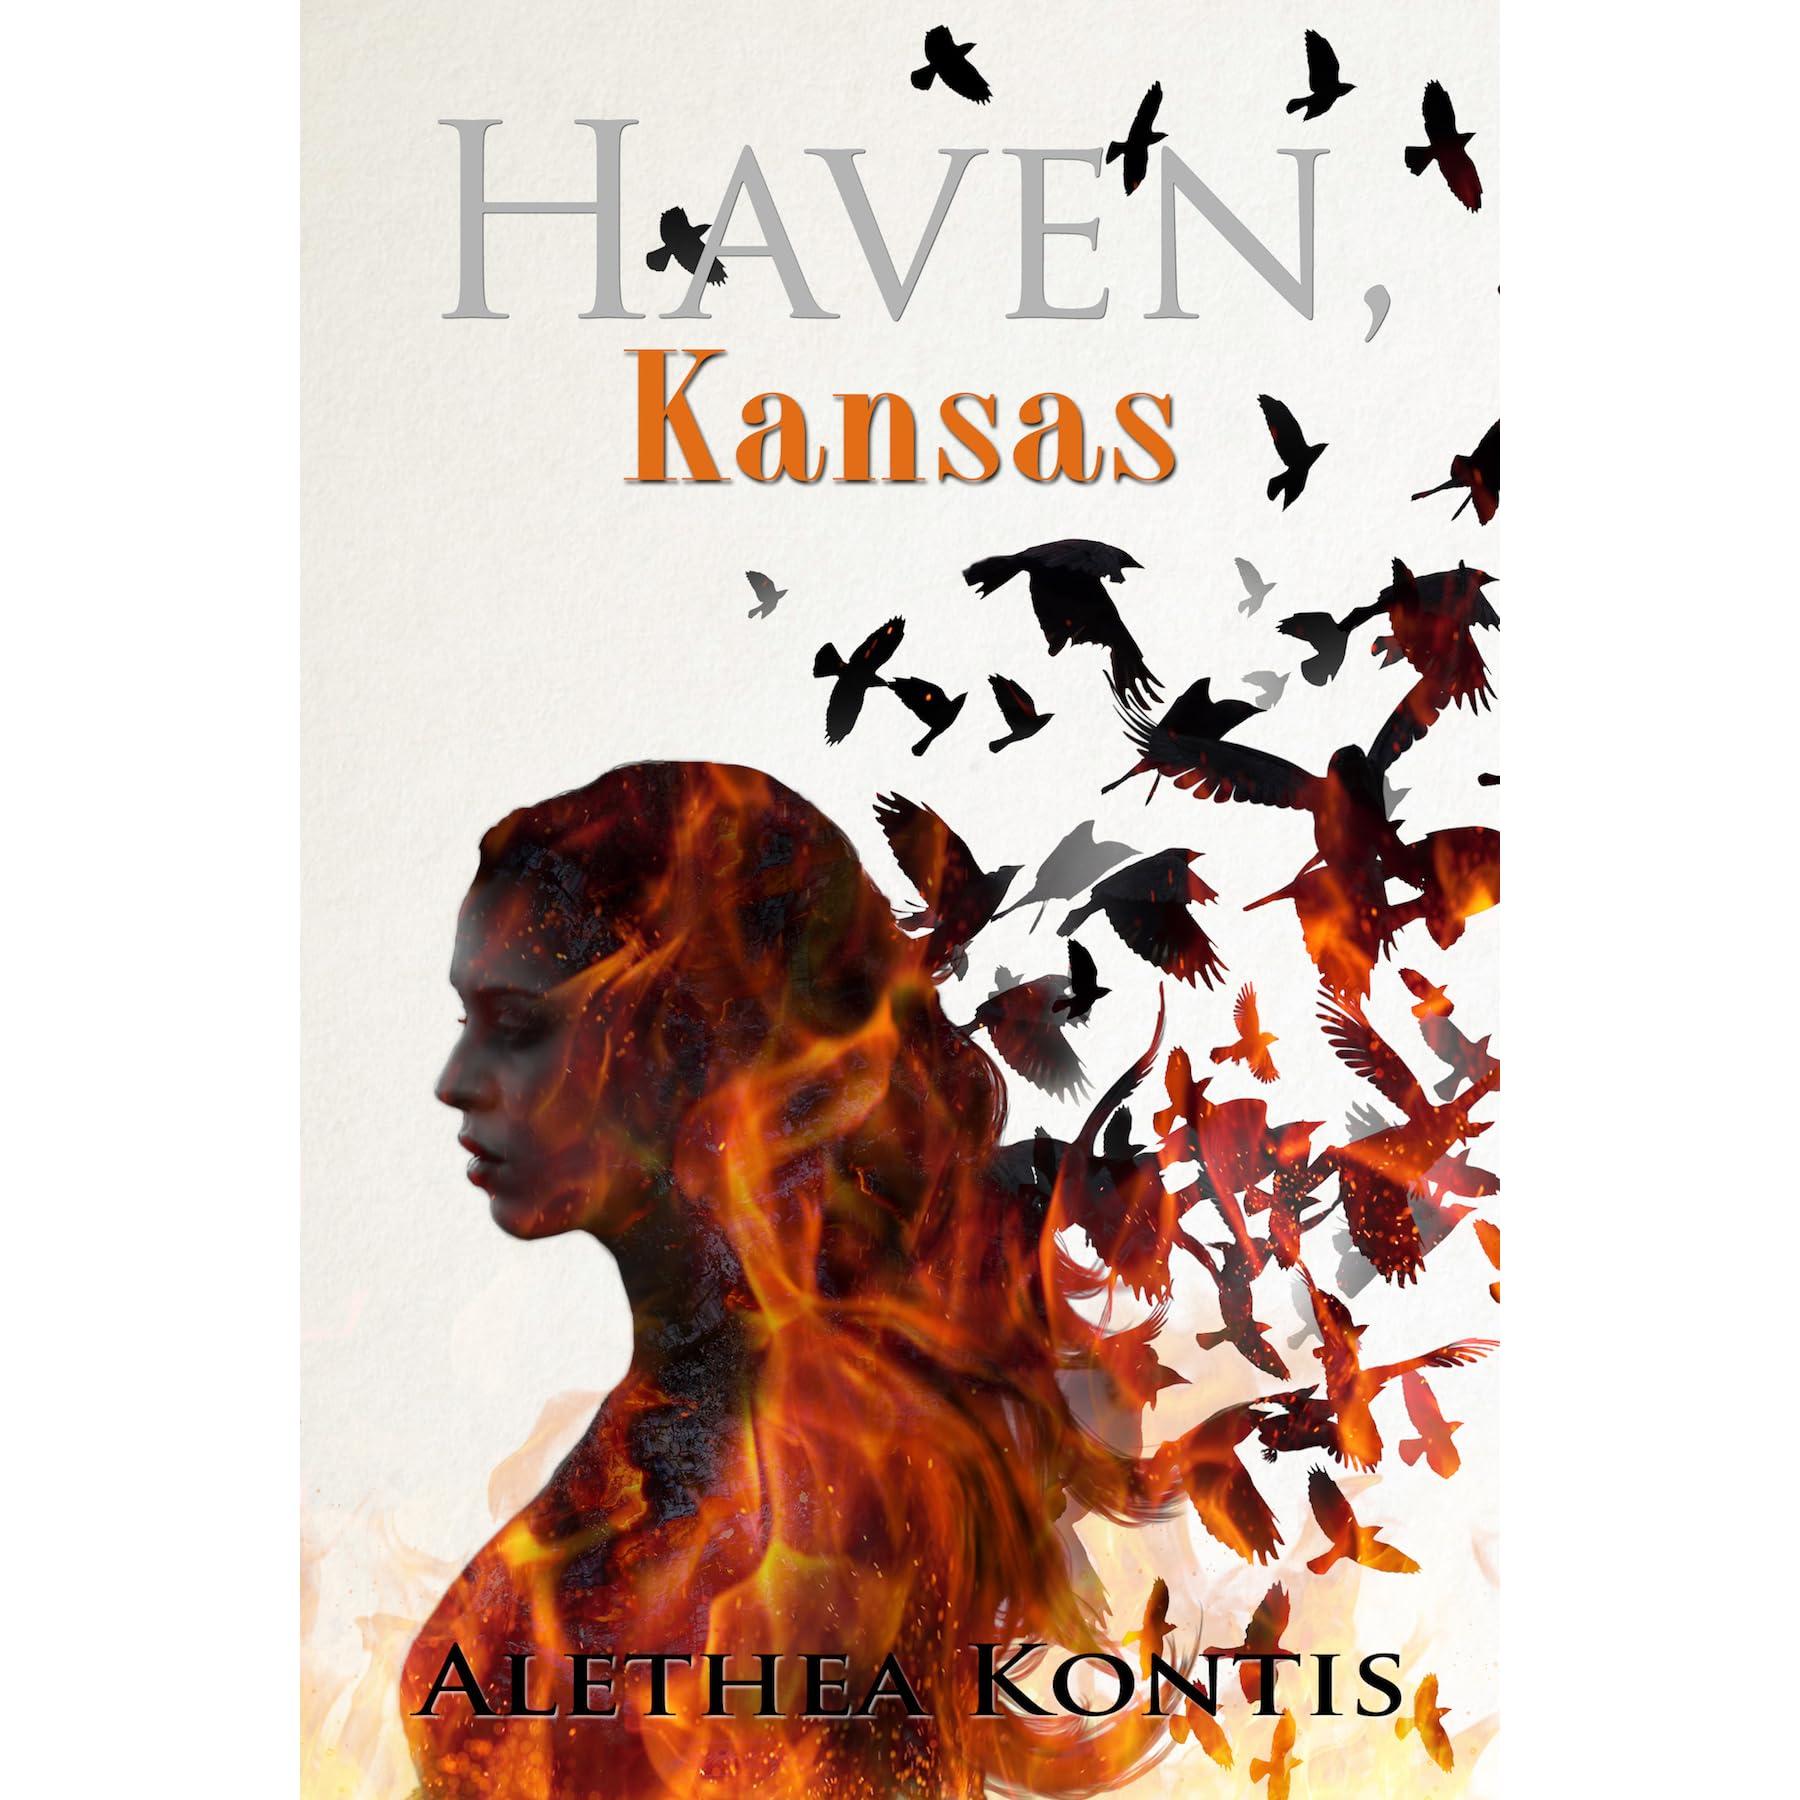 Book reviews and summaries hamlet summary